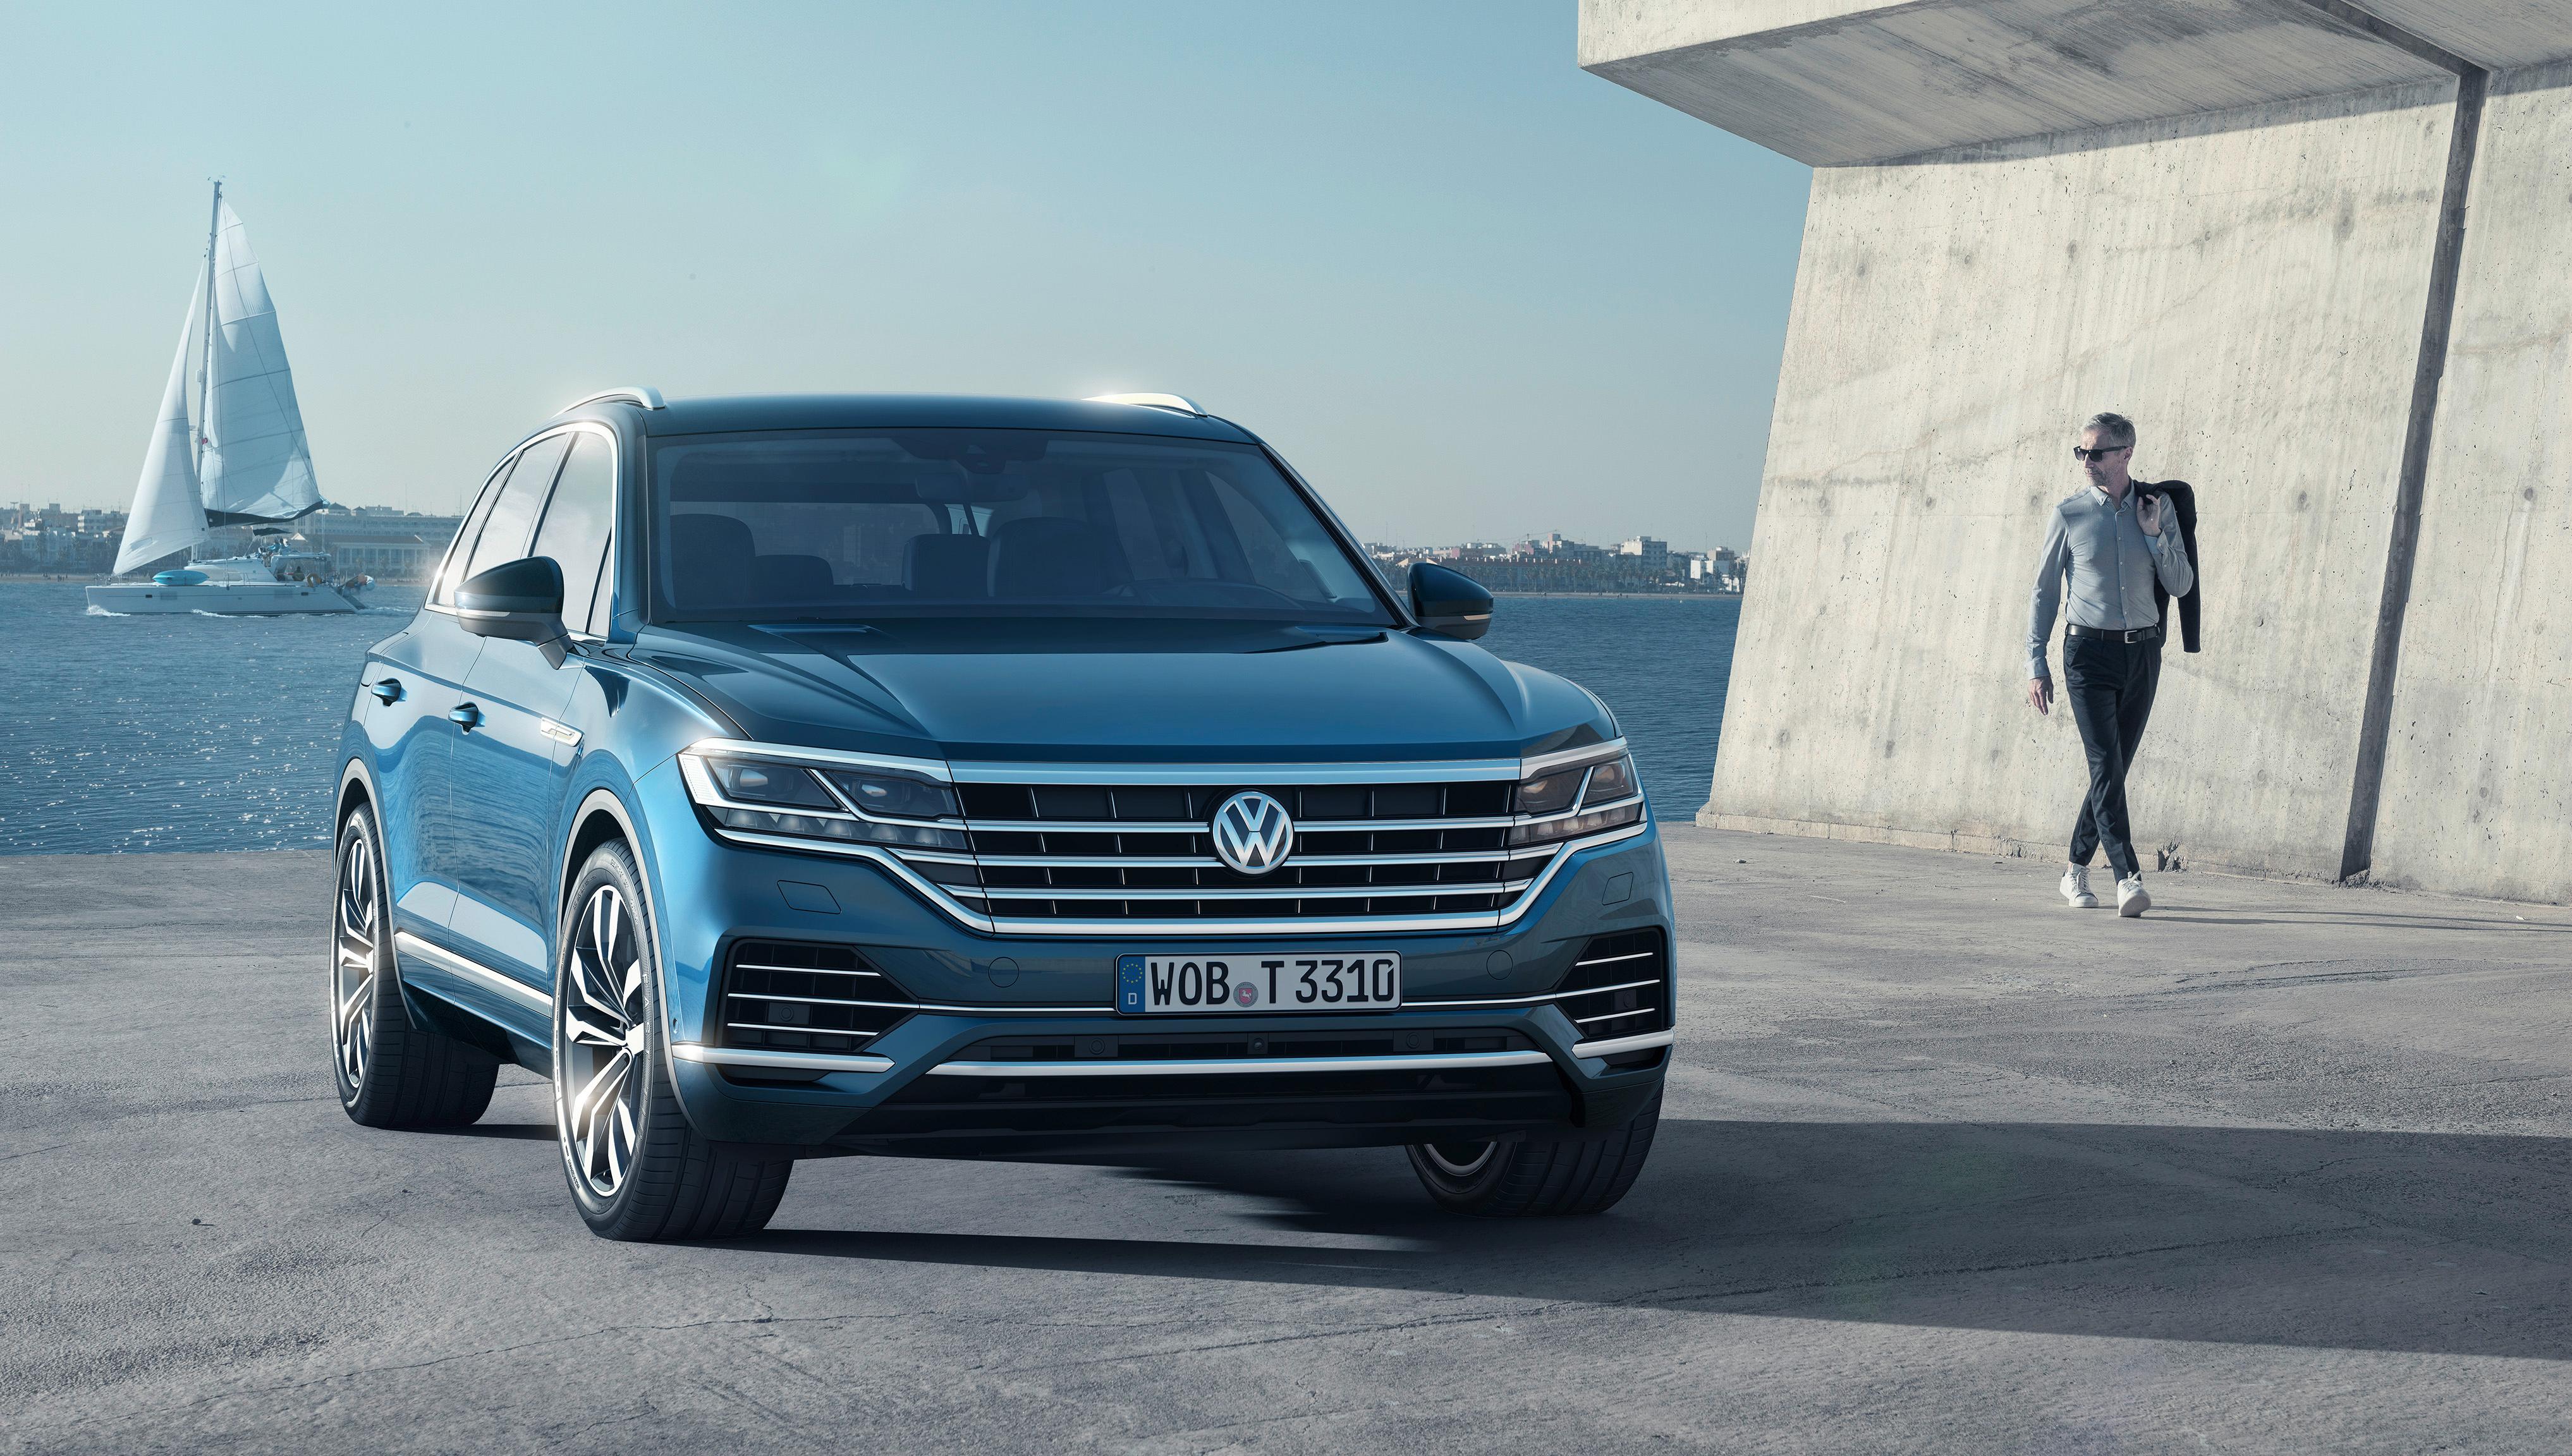 2018 Volkswagen Touareg V6 TDi 4K Wallpaper HD Car Wallpapers 4069x2304